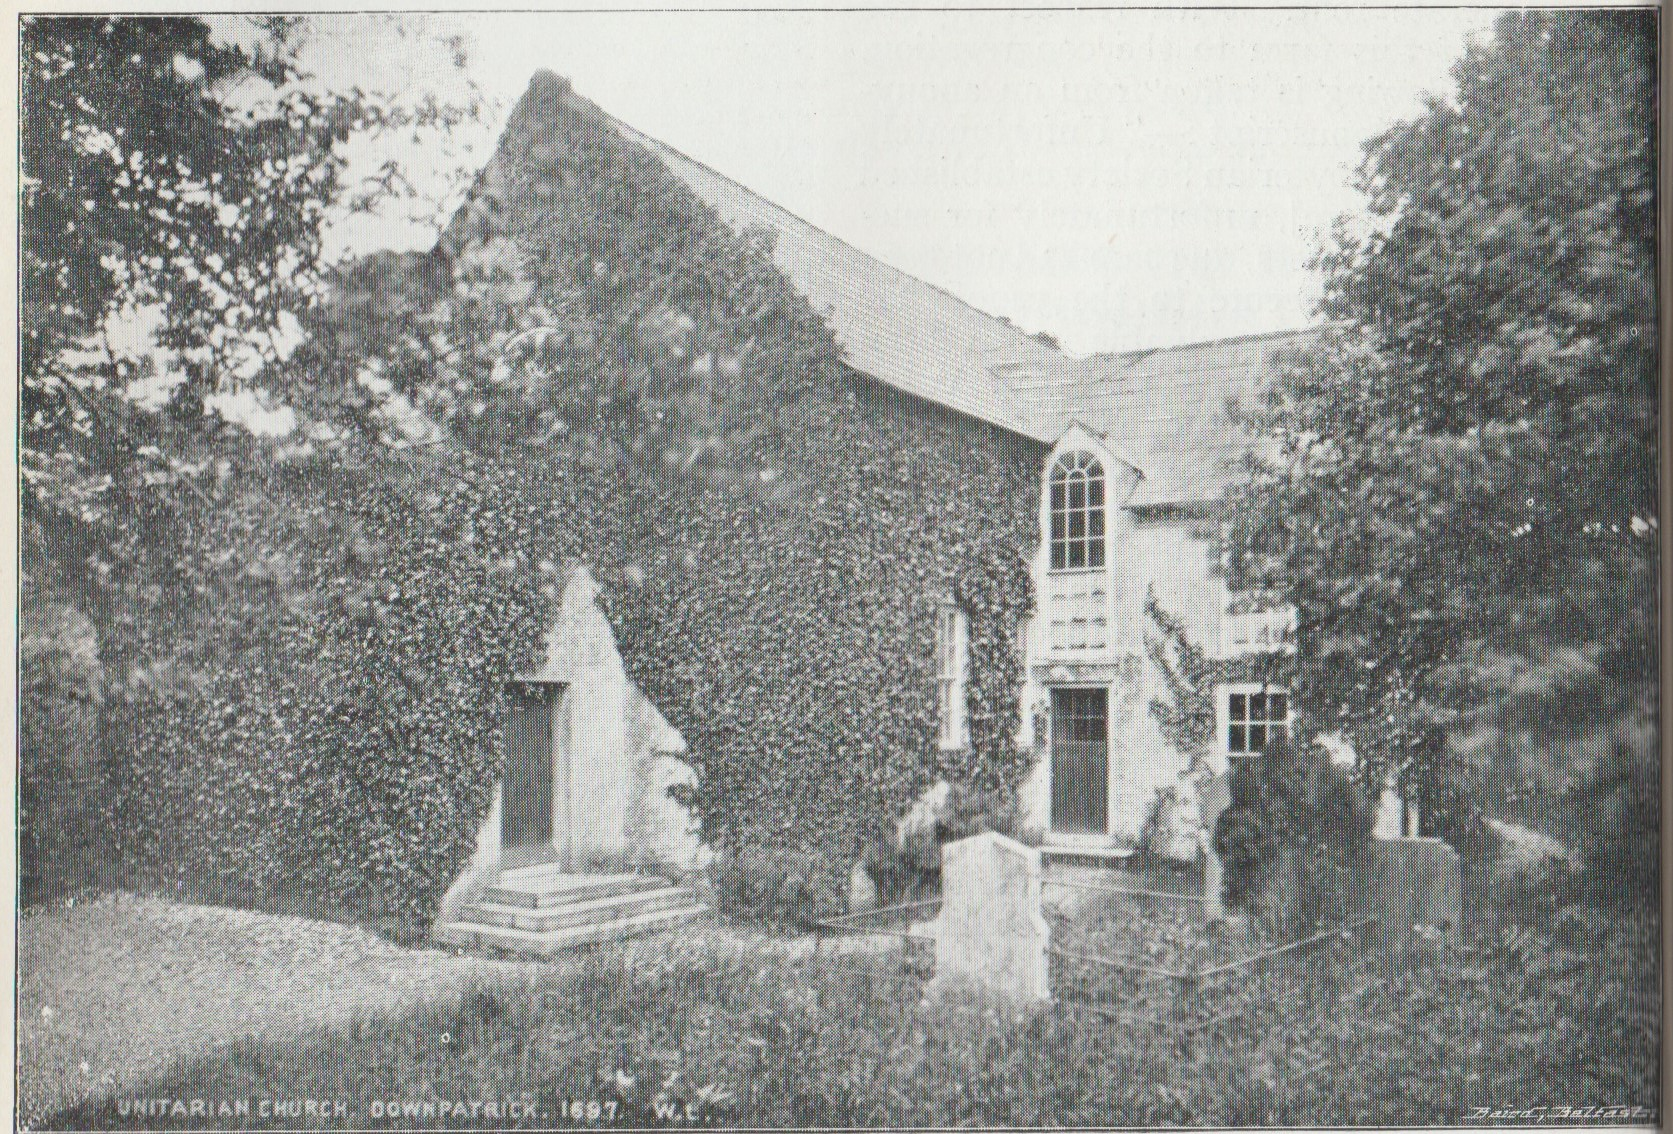 Downpatrick July 1909